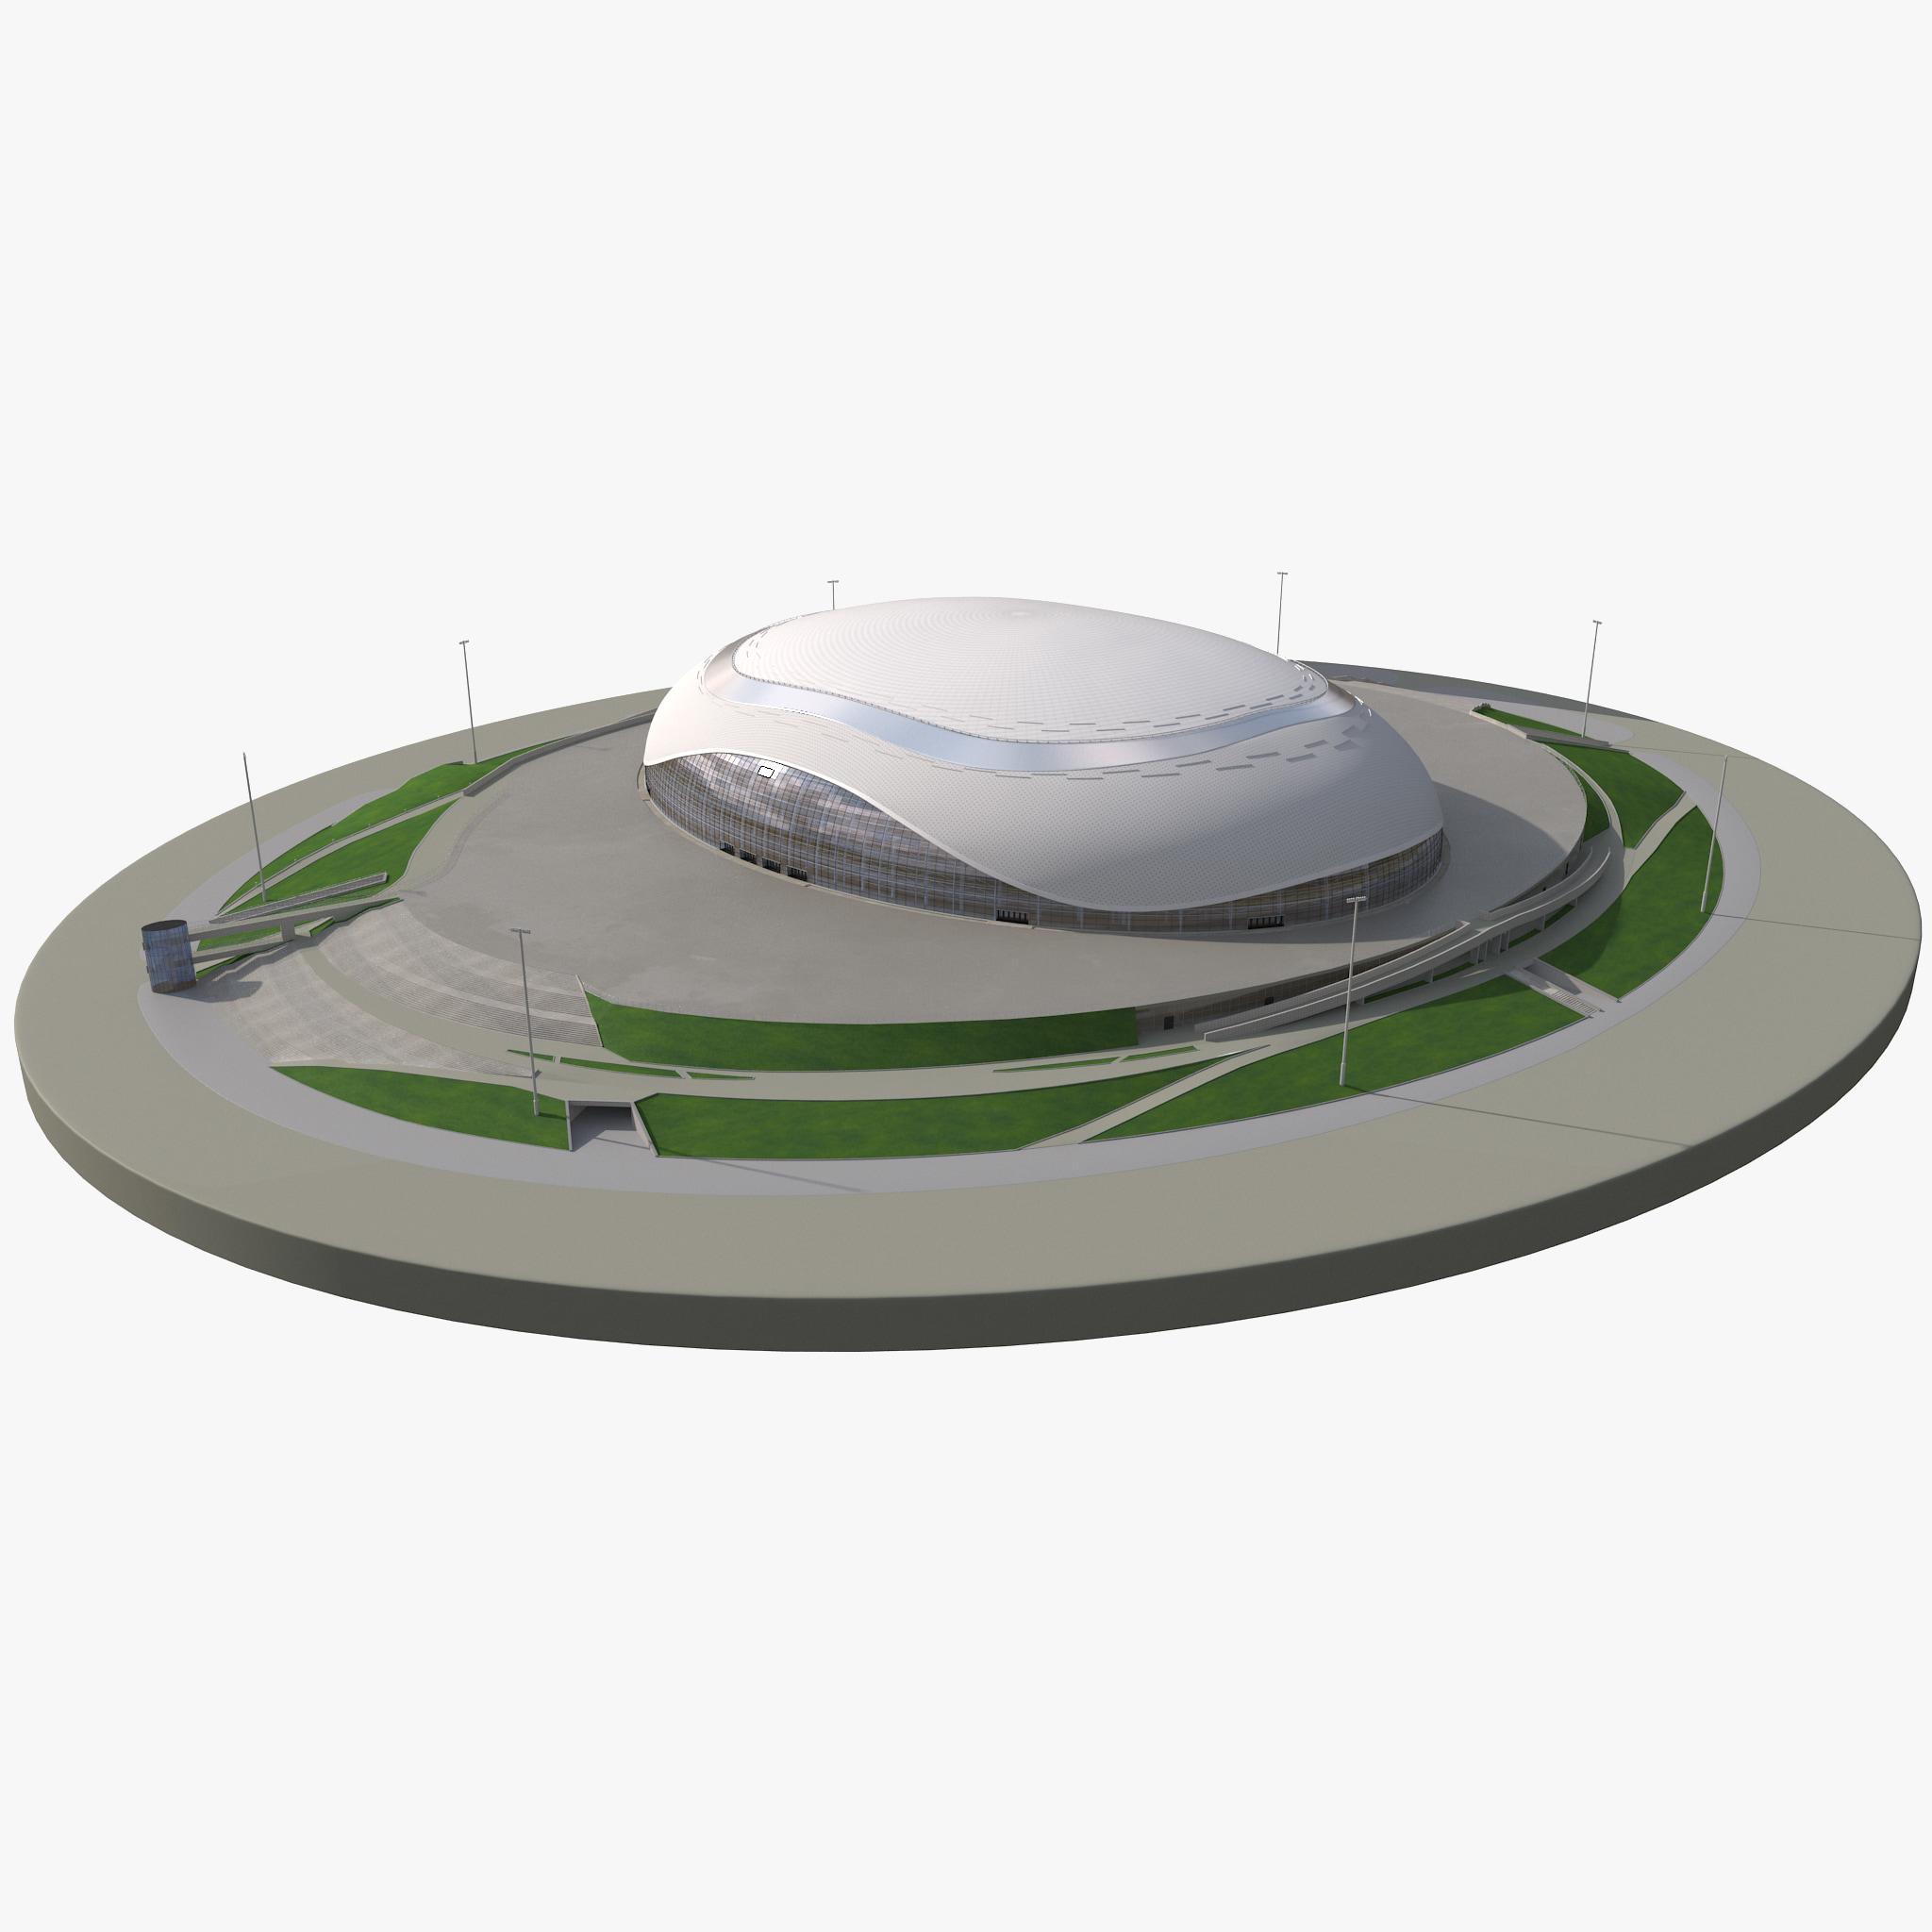 Bolshoy Ice Dome Sochi_1.jpg